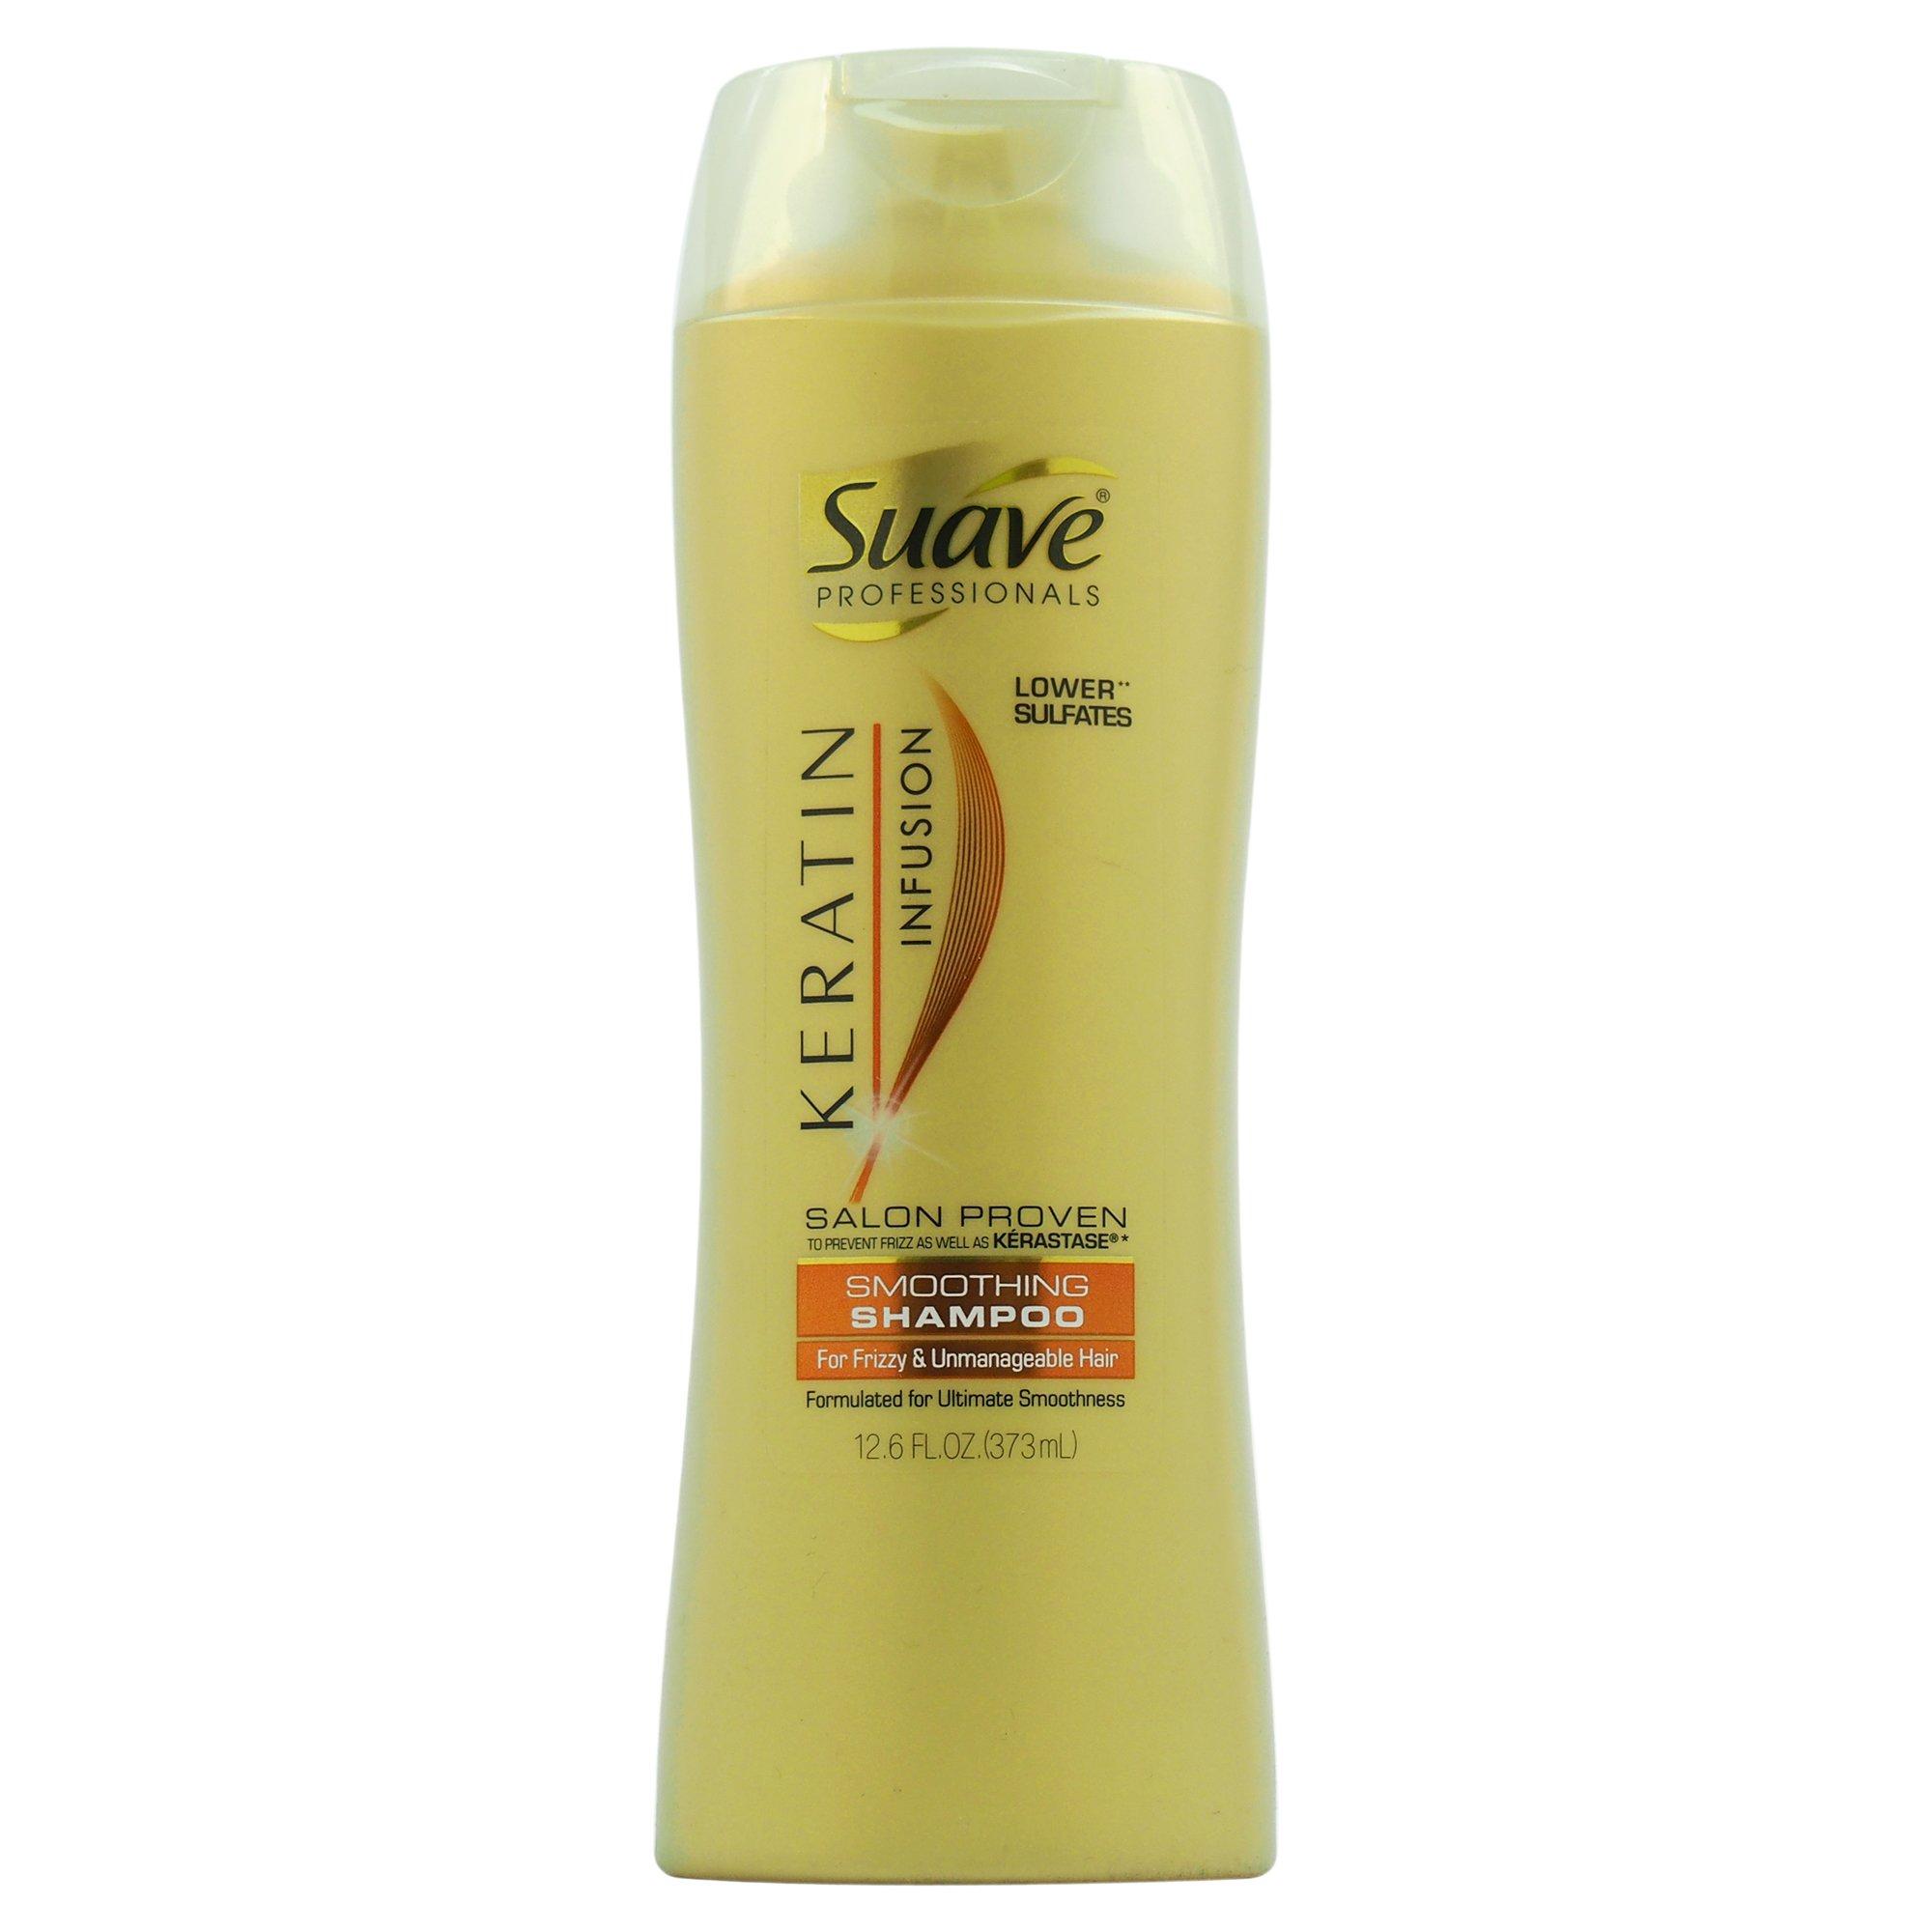 Suave Professionals Smoothing Shampoo Keratin Infusion 12.6 oz